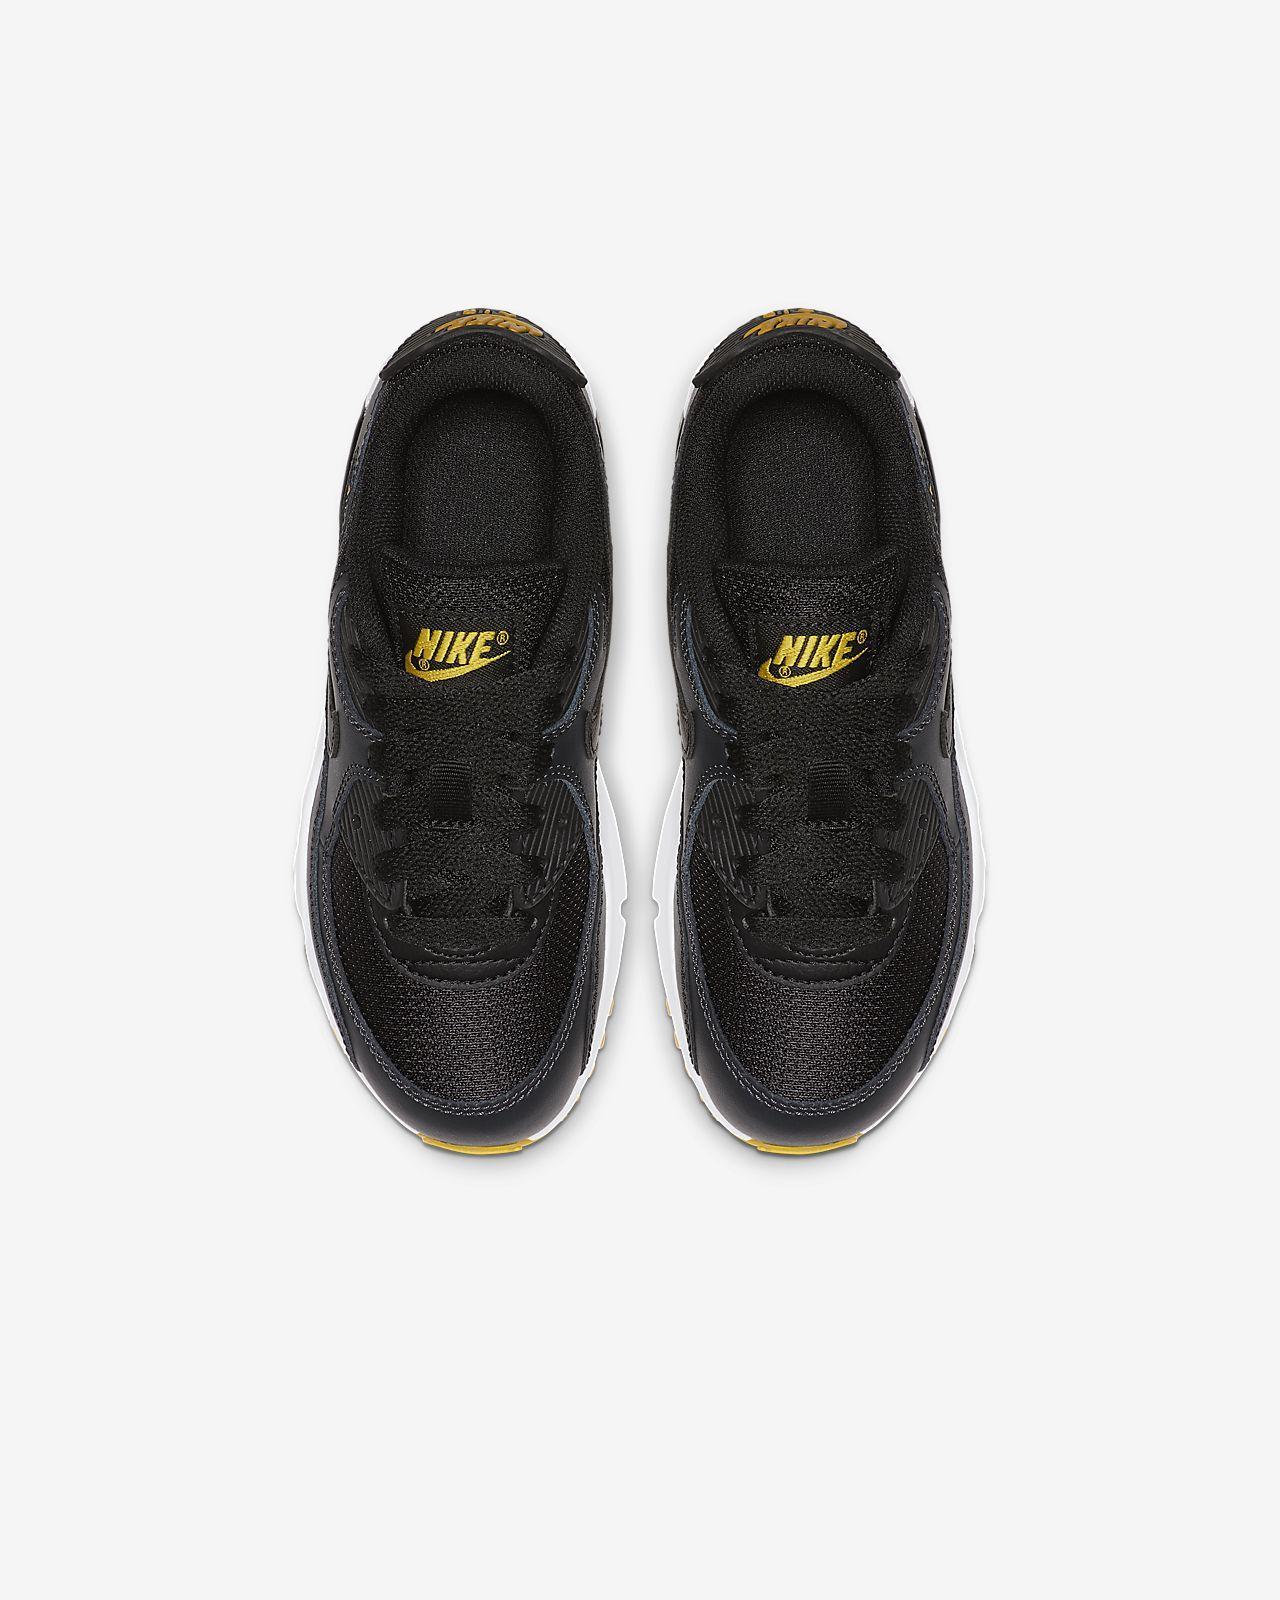 Nike Air Max 90 Mesh Schuh für jüngere Kinder (27,5-35)